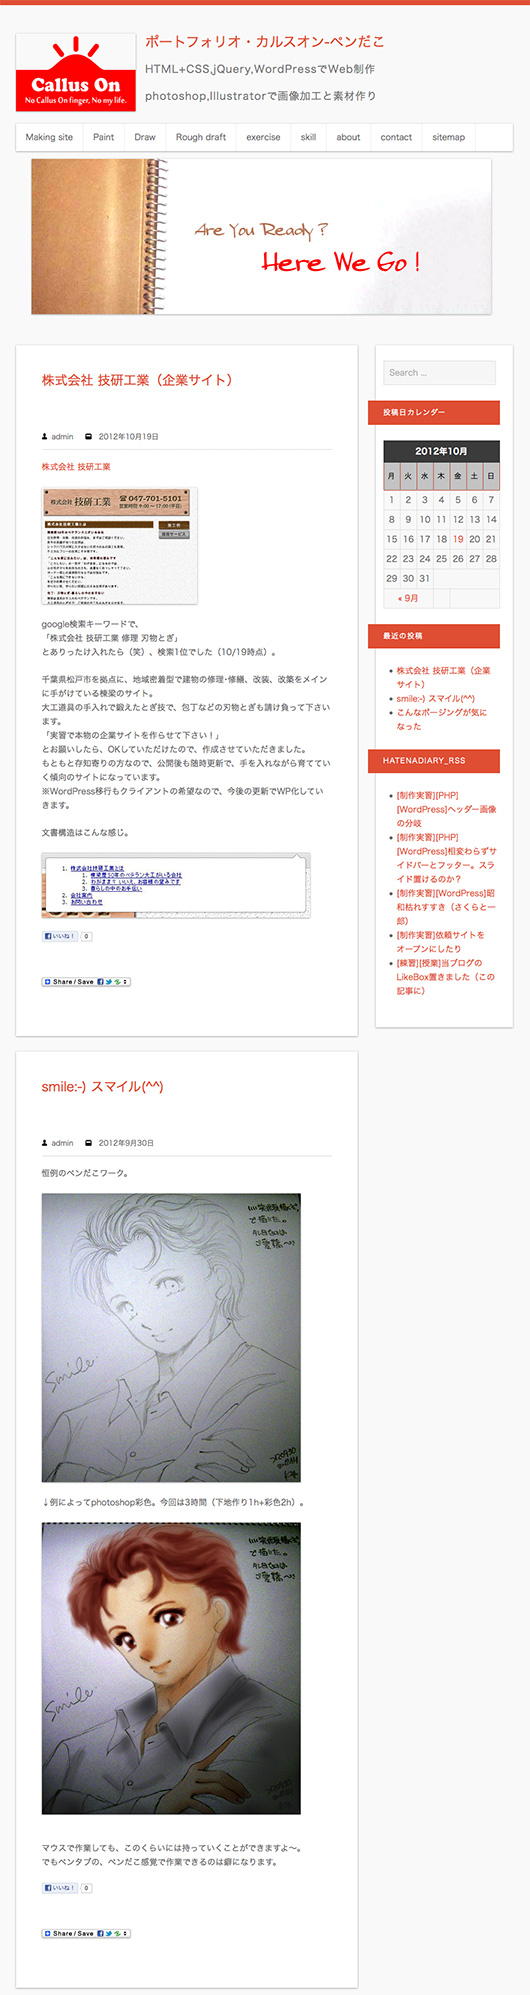 f:id:web-css-design:20121024001152j:image